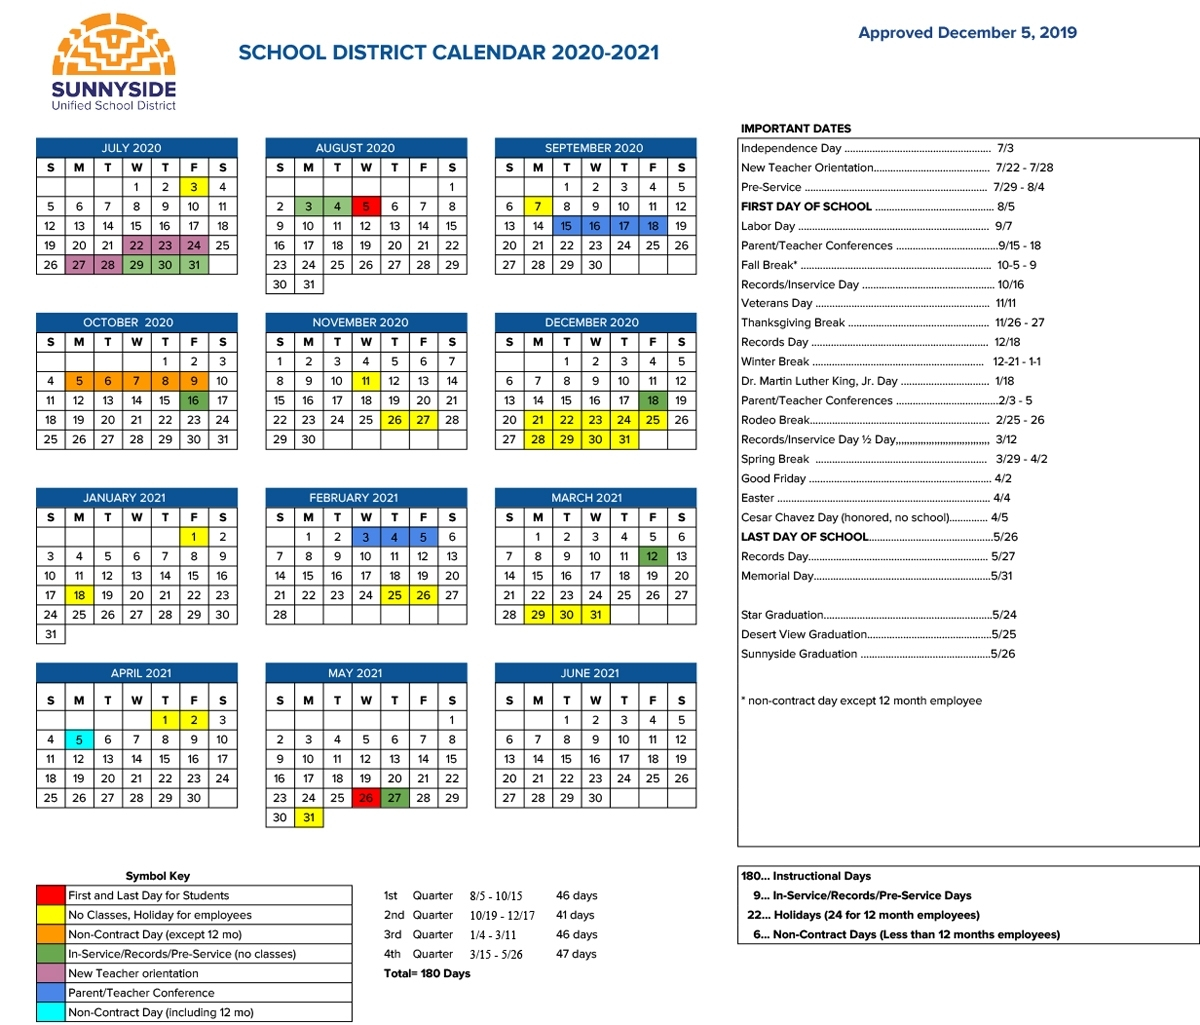 Uc Berkeely 2020 Spring Semester Months  Calendar pertaining to Uc Berkeley Academic Calander